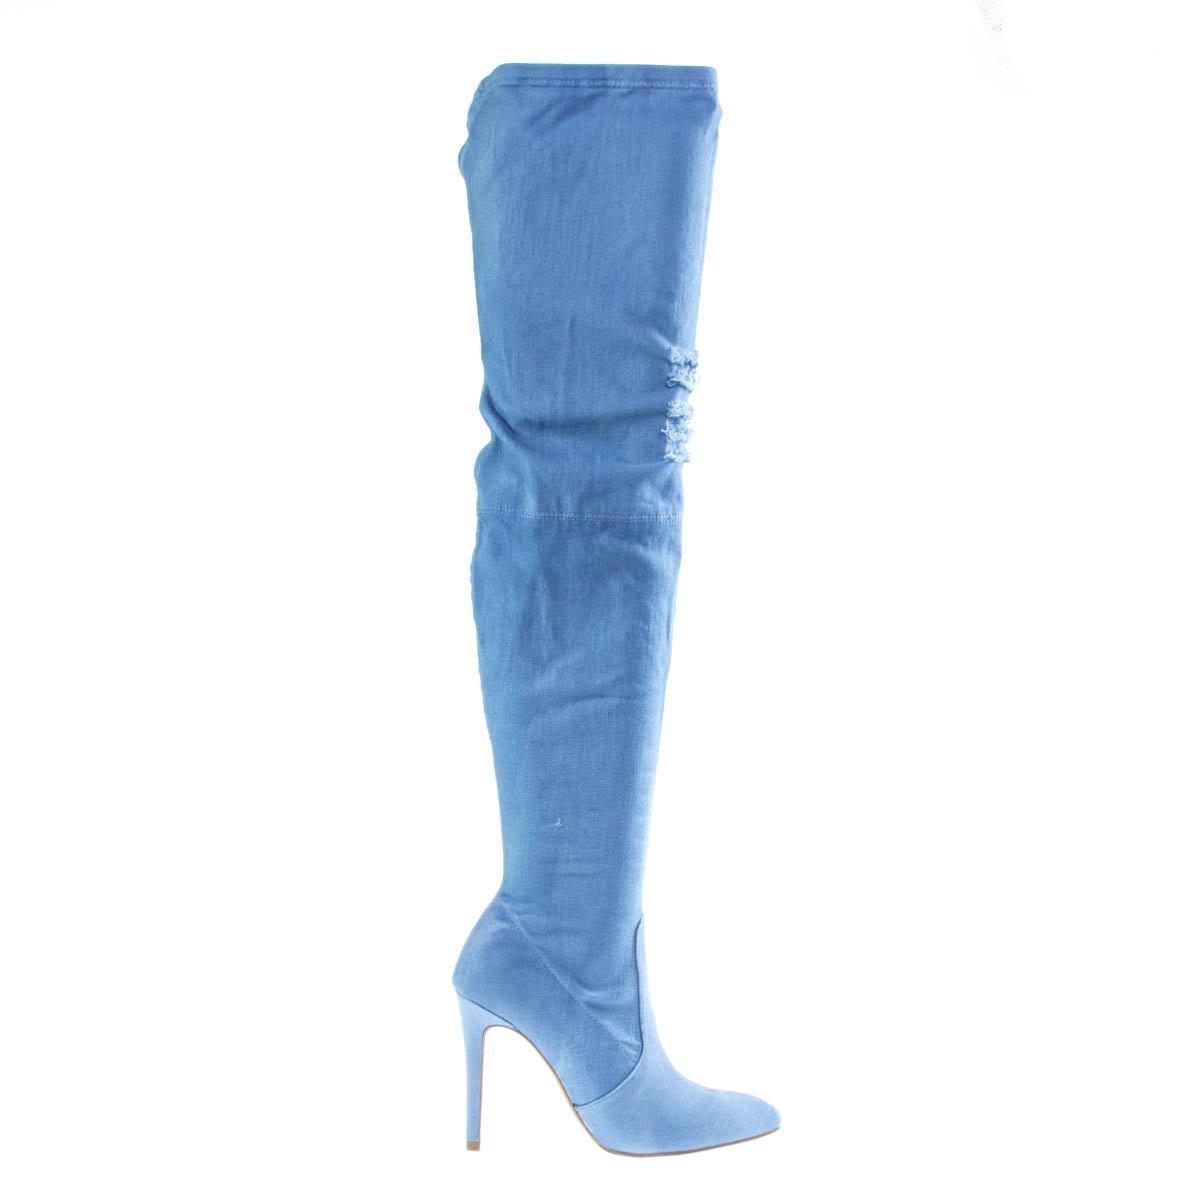 Jobe OTK Over The Knee High High High Heel Dress Boots 2 Destroyed Ripped Holes 03d903